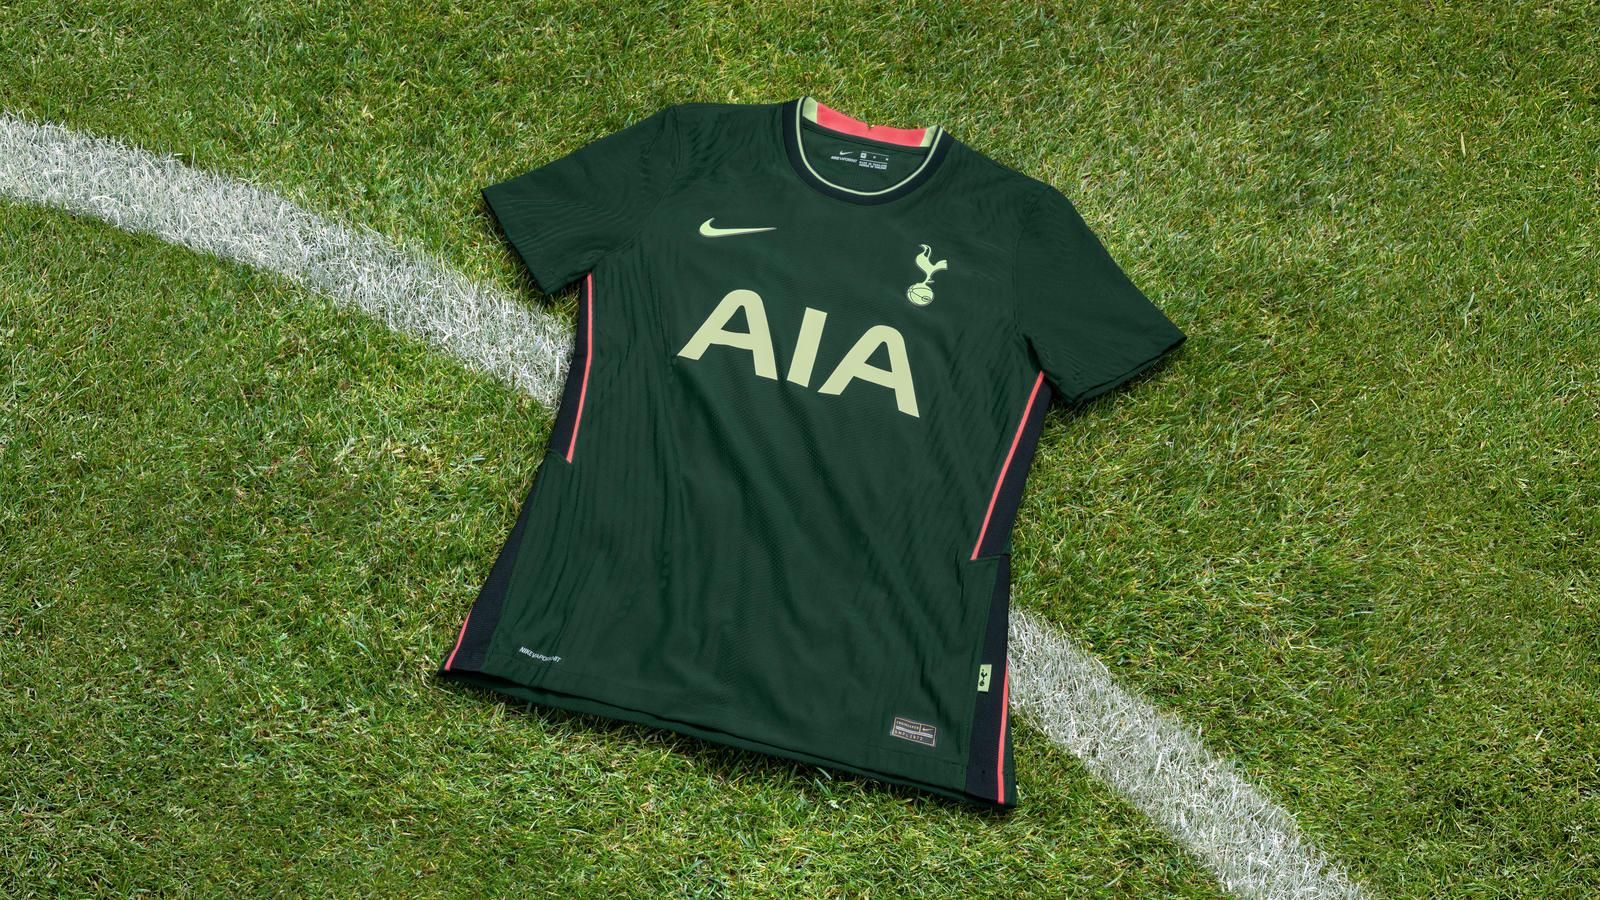 Tottenham Hotspur Release 2020 21 Home Away Kits Pursuit Of Dopeness In 2020 Tottenham Tottenham Hotspur Home And Away